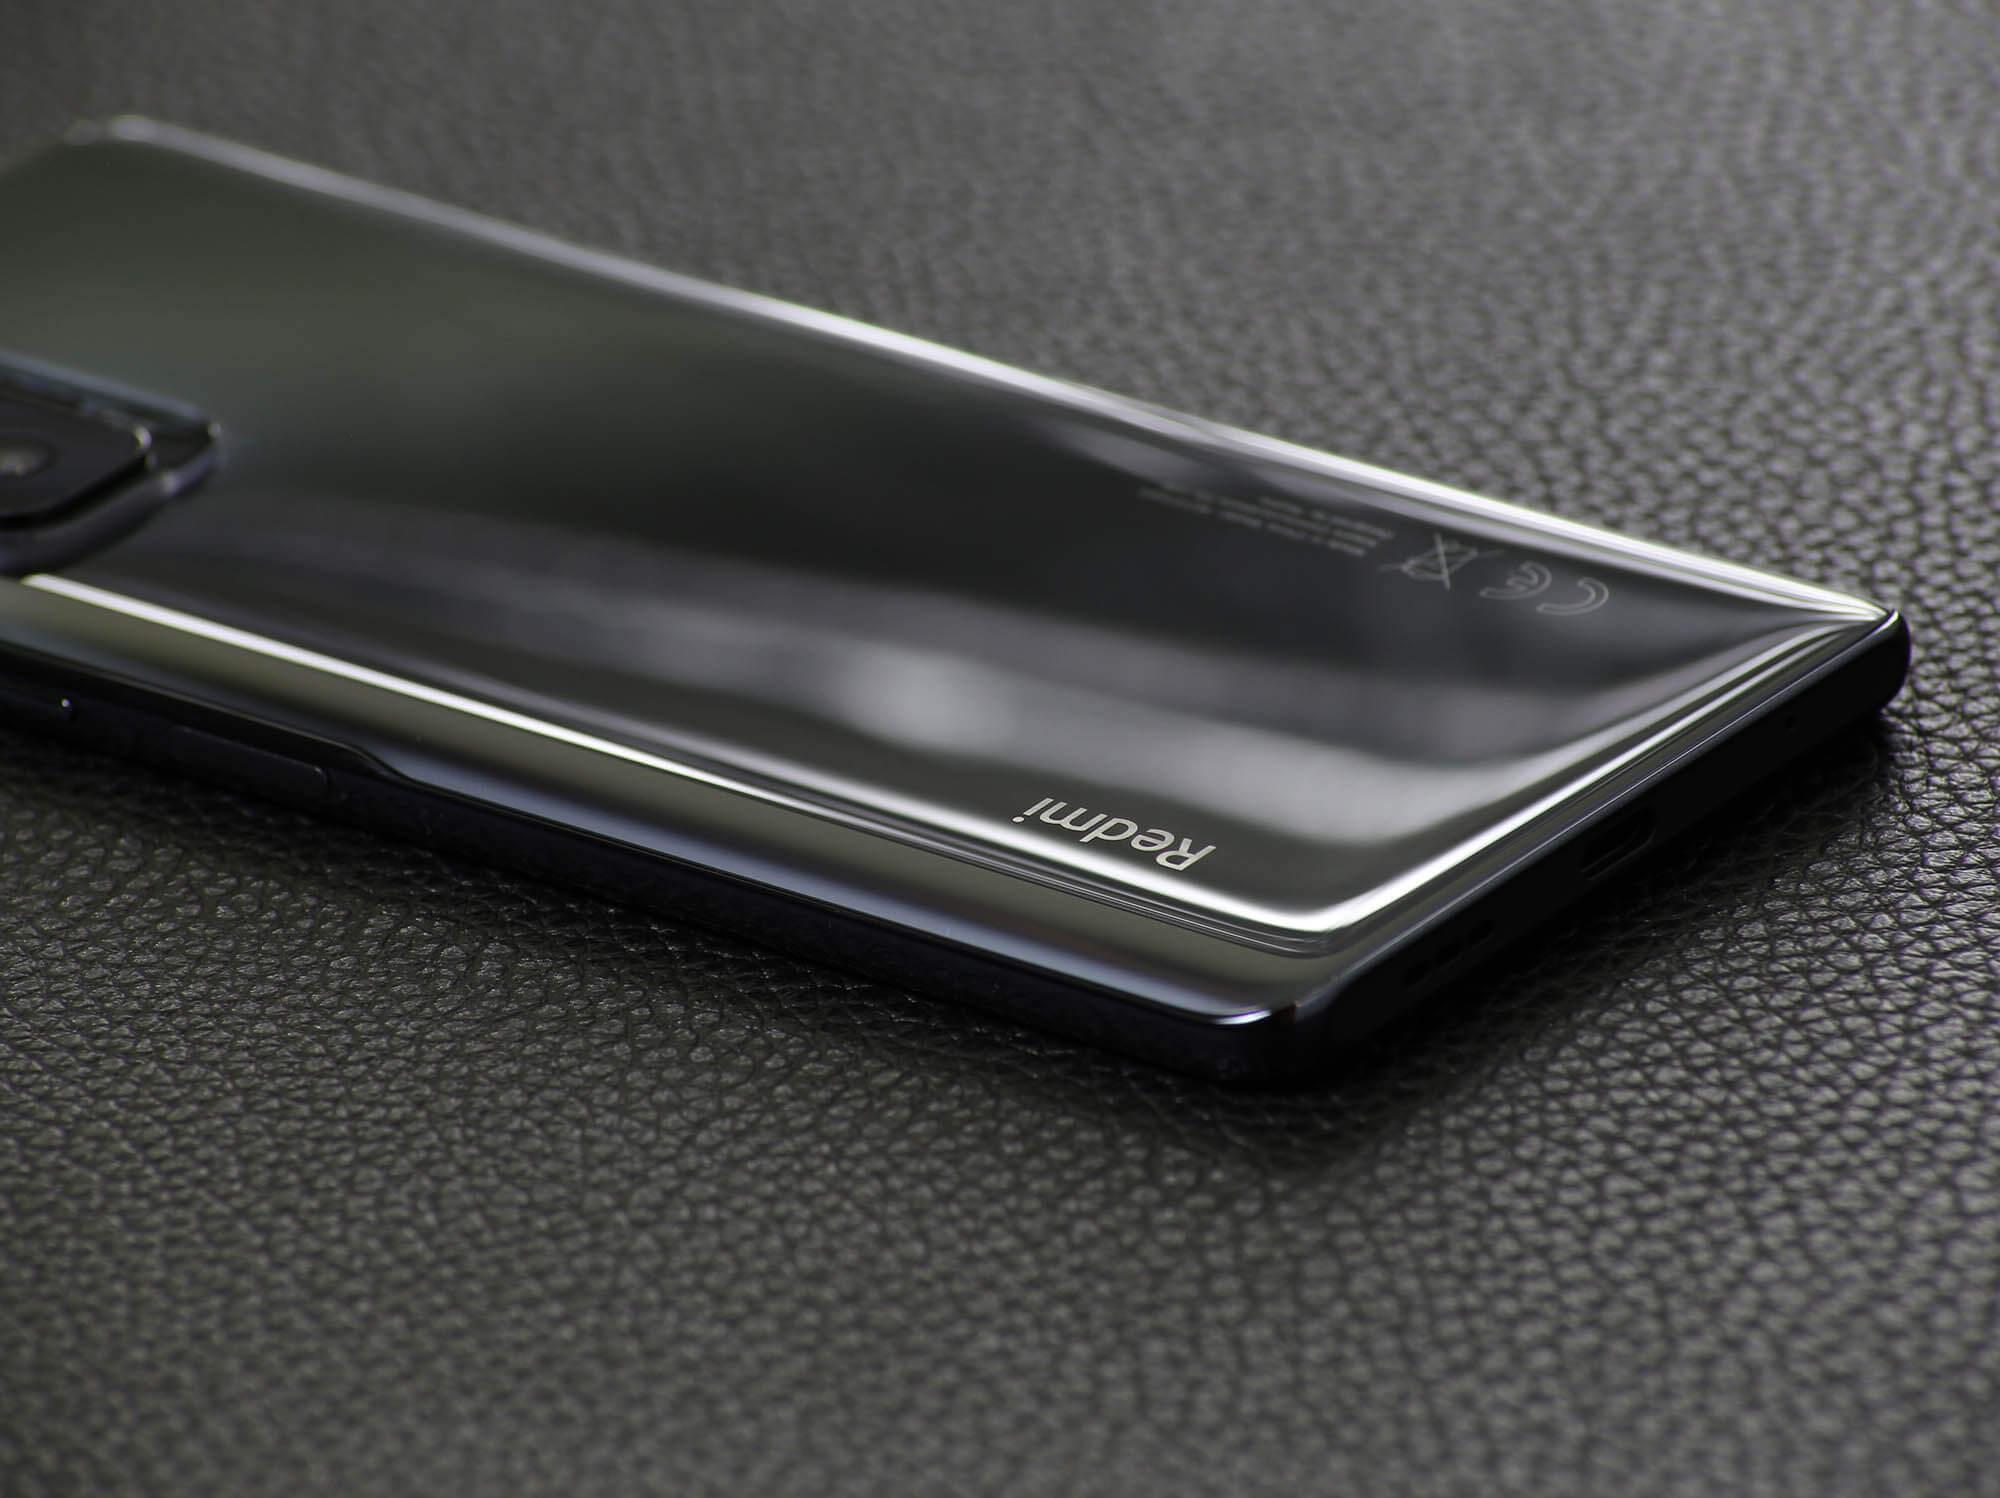 Redmi Note 10 Proは明るすぎない上品な鏡面仕上げ